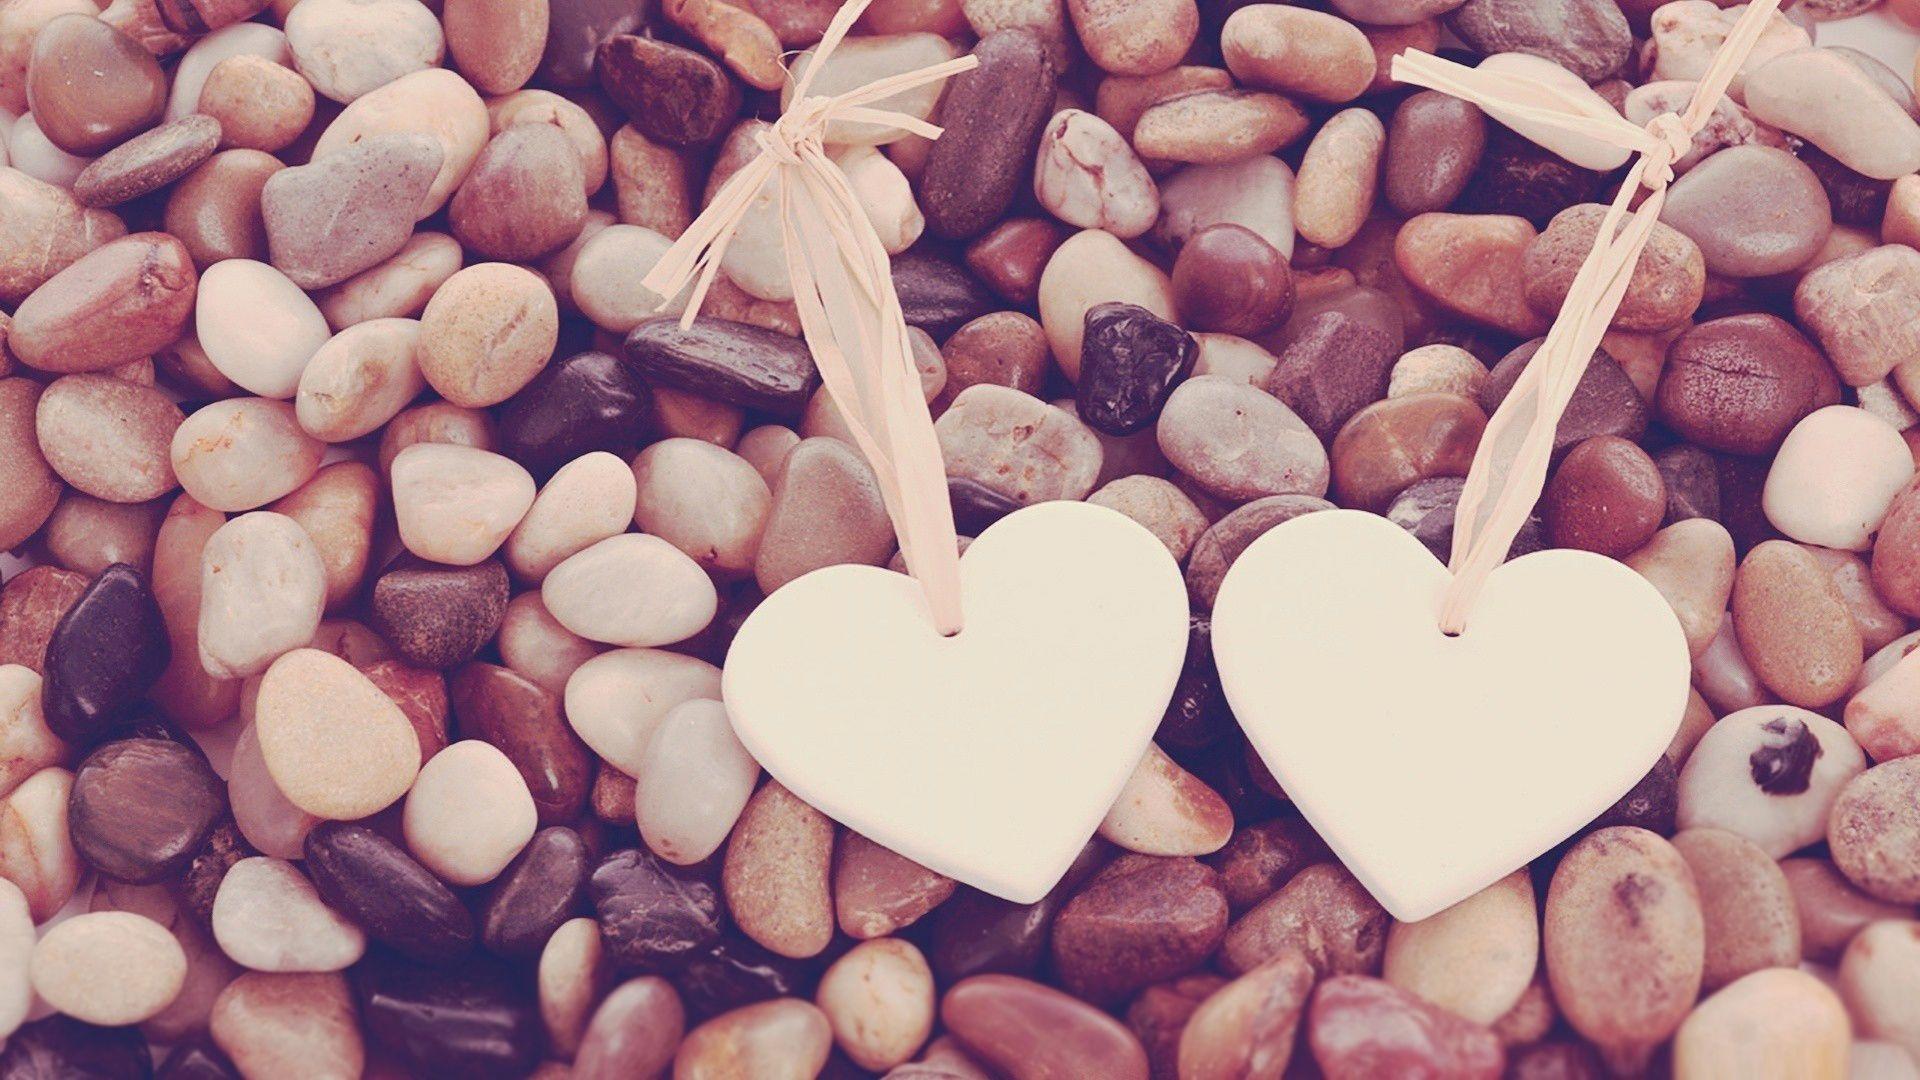 Hd wallpaper you need - Two Hearts 1080p Hd Wallpaper Love